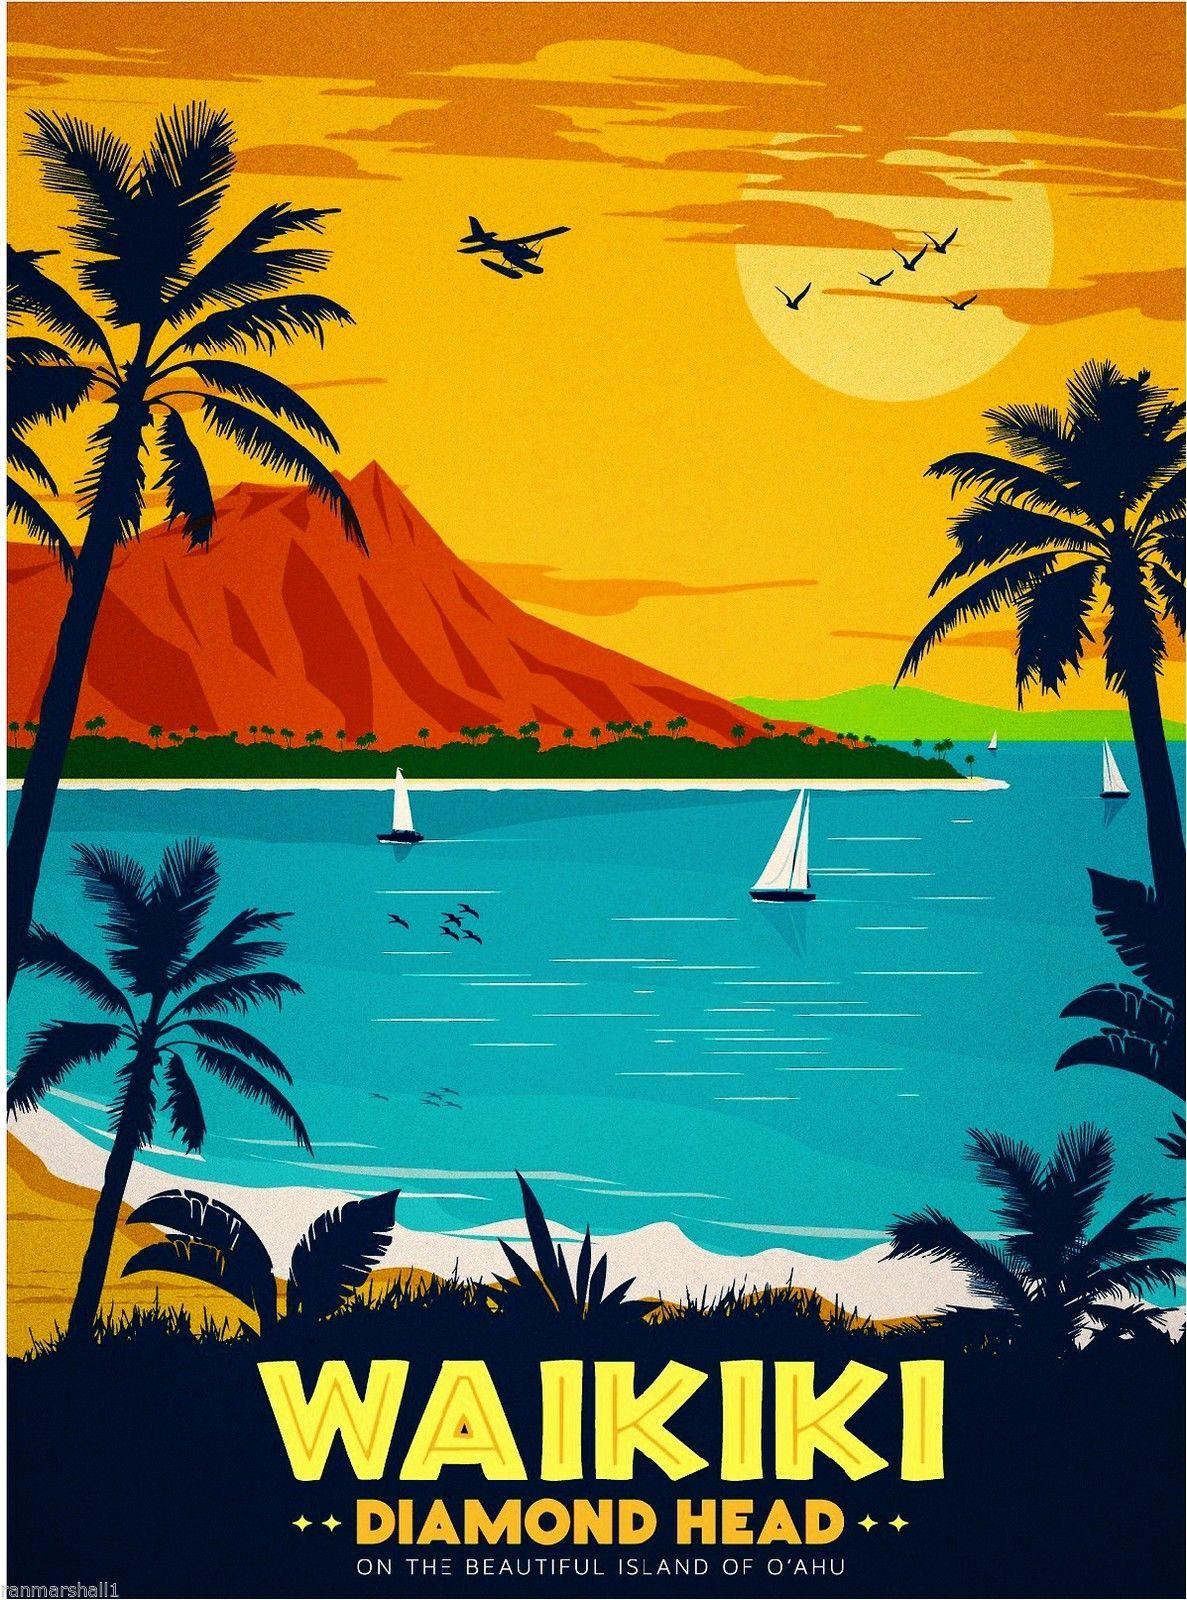 Waikiki Retro Travel Poster Vintage Travel Posters Travel Art